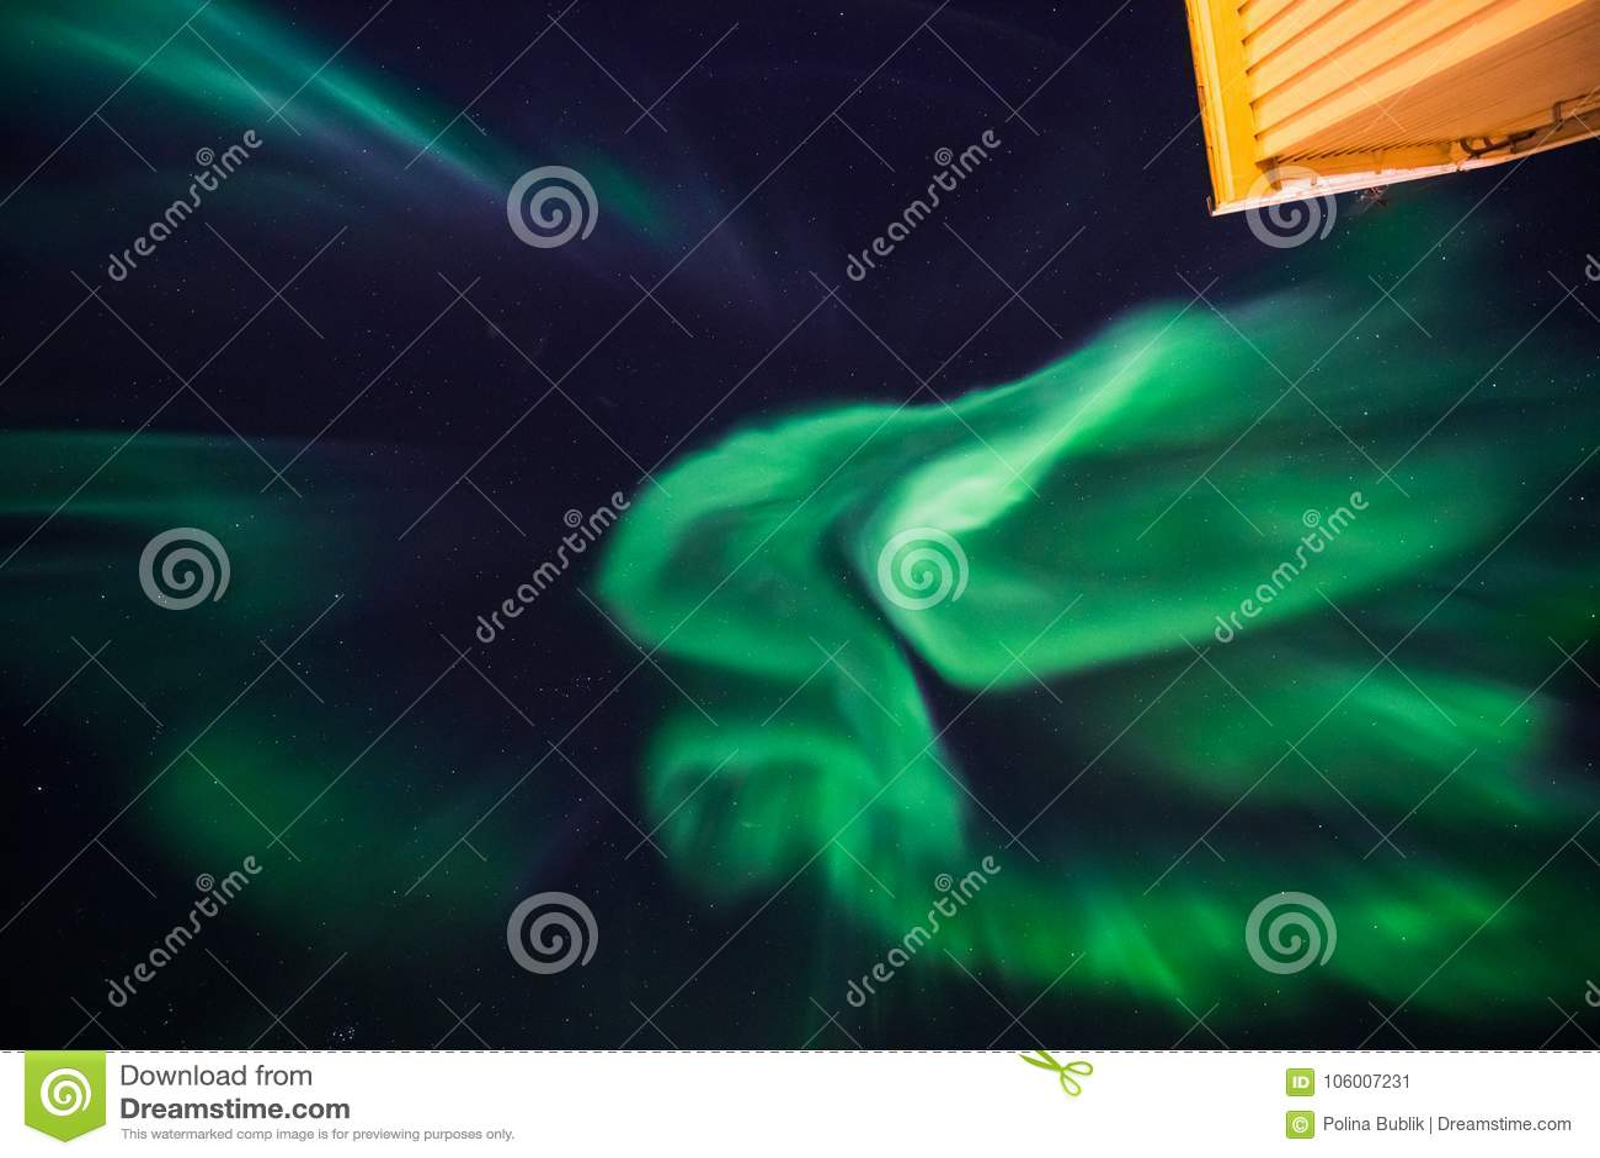 The Polar Arctic Northern Lights Aurora Borealis Sky Star In